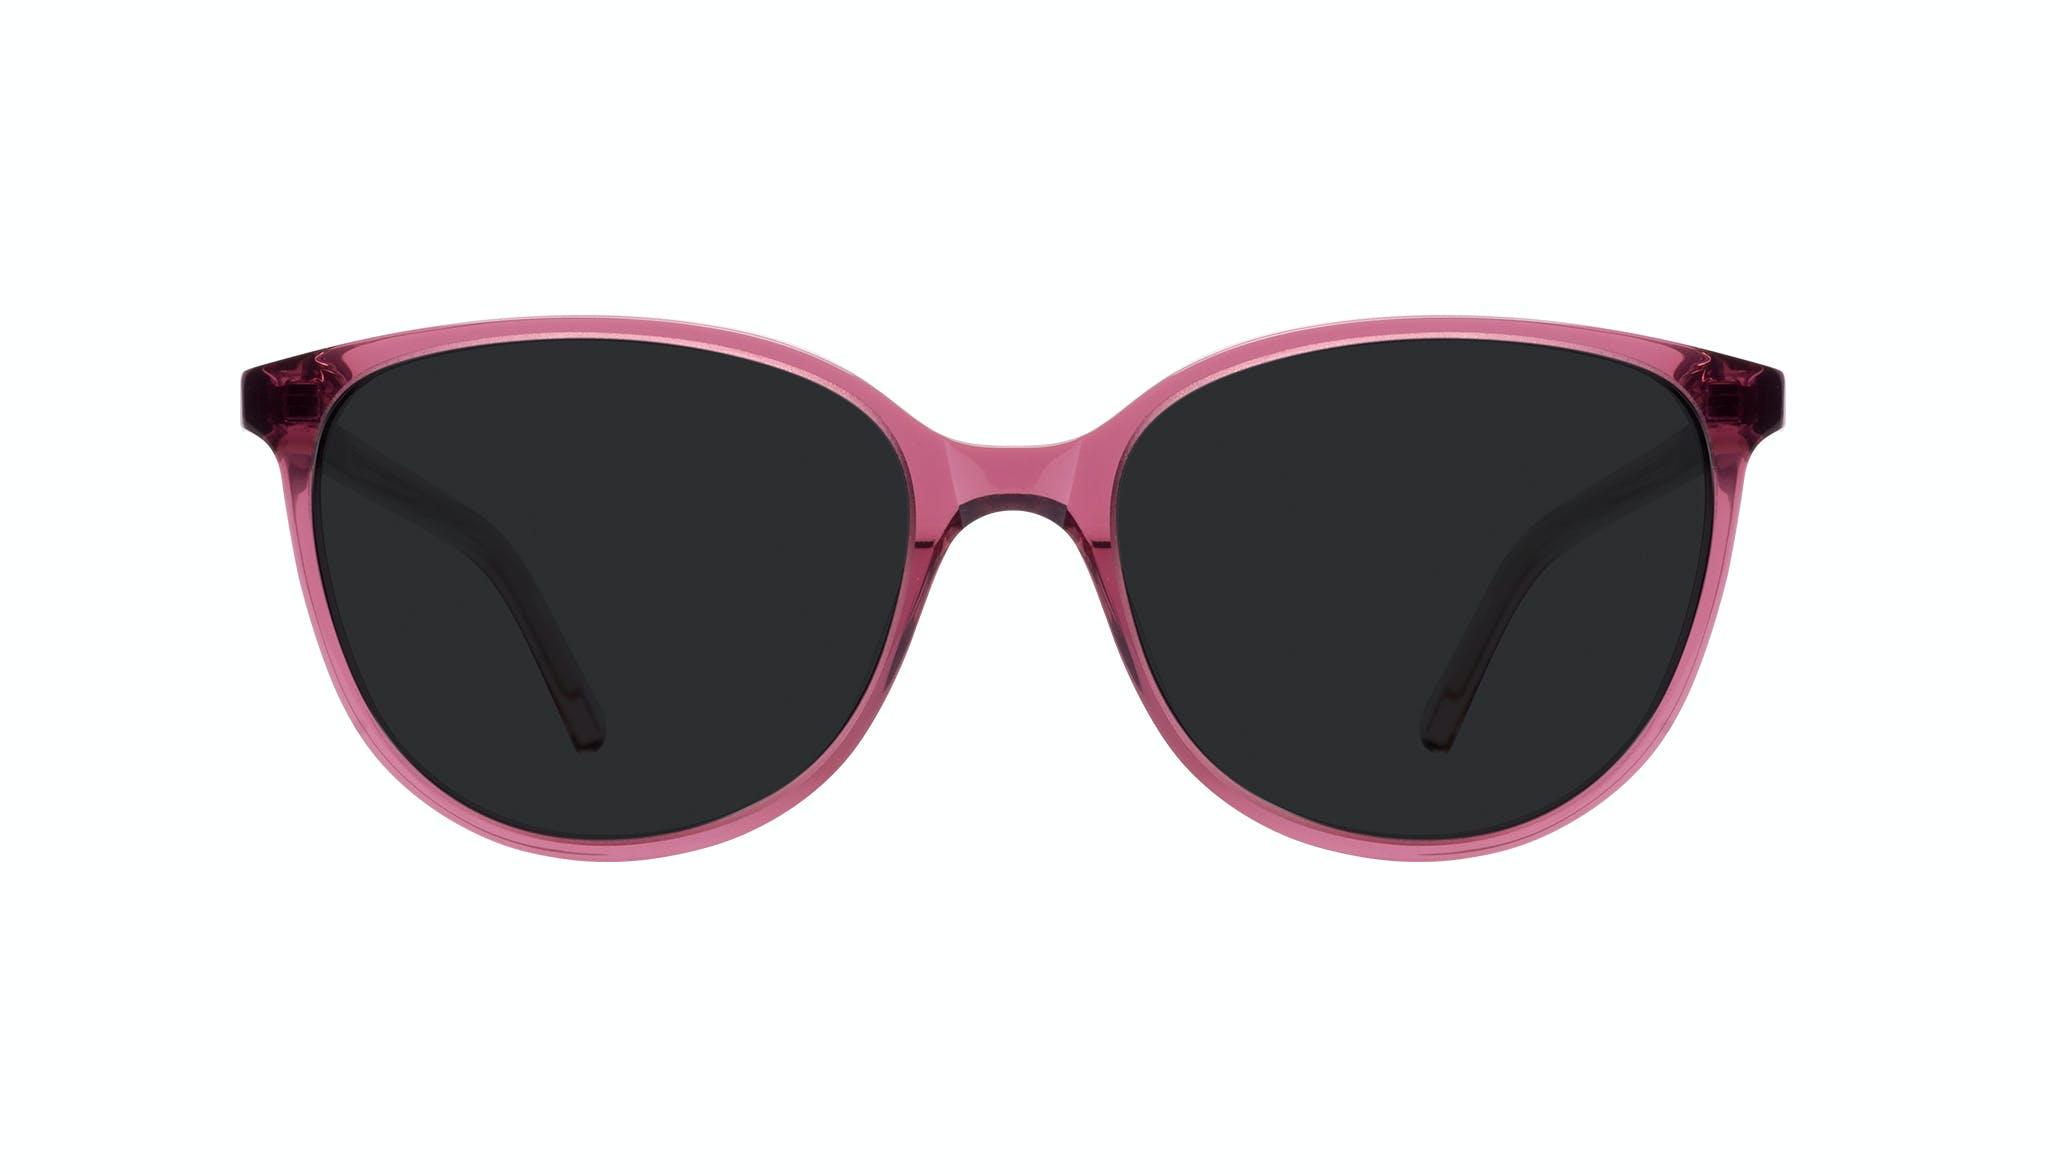 Affordable Fashion Glasses Cat Eye Sunglasses Women Imagine Petite Berry